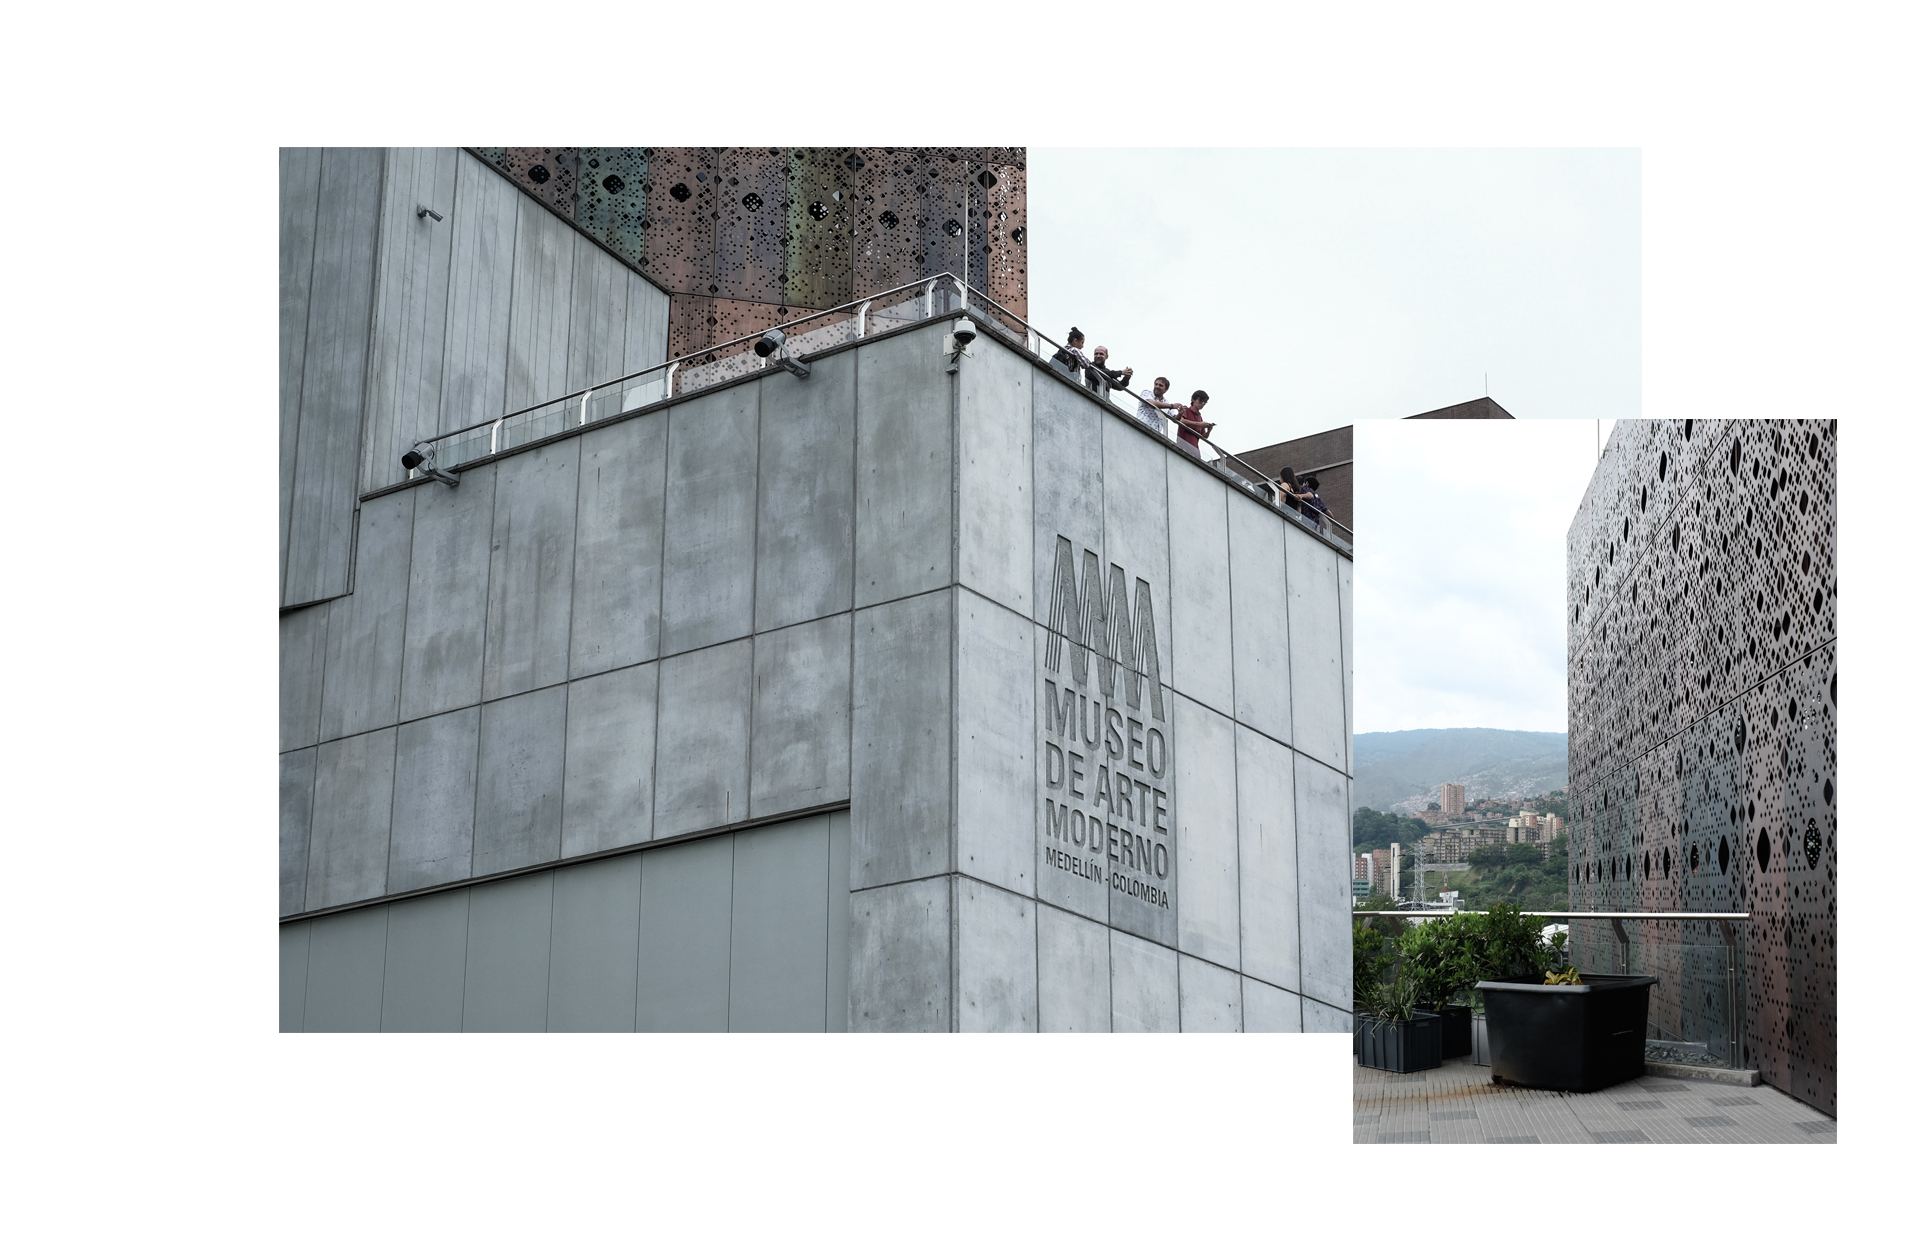 museo arte moderne concrete grey